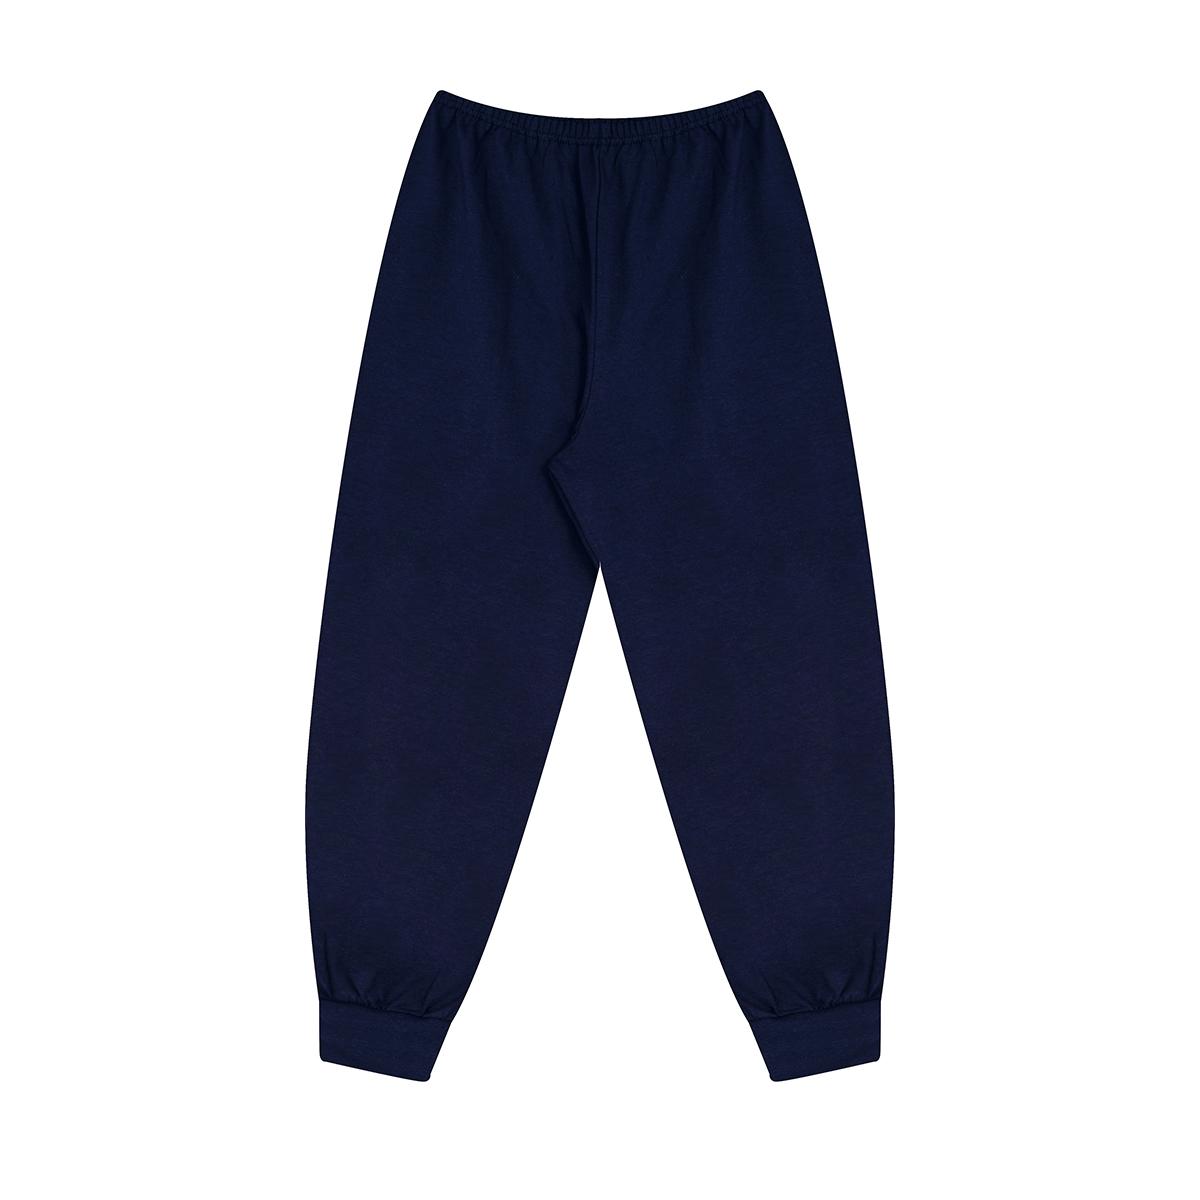 Pijama Infantil Menino Estampa Brilha no Escuro Gola Redonda